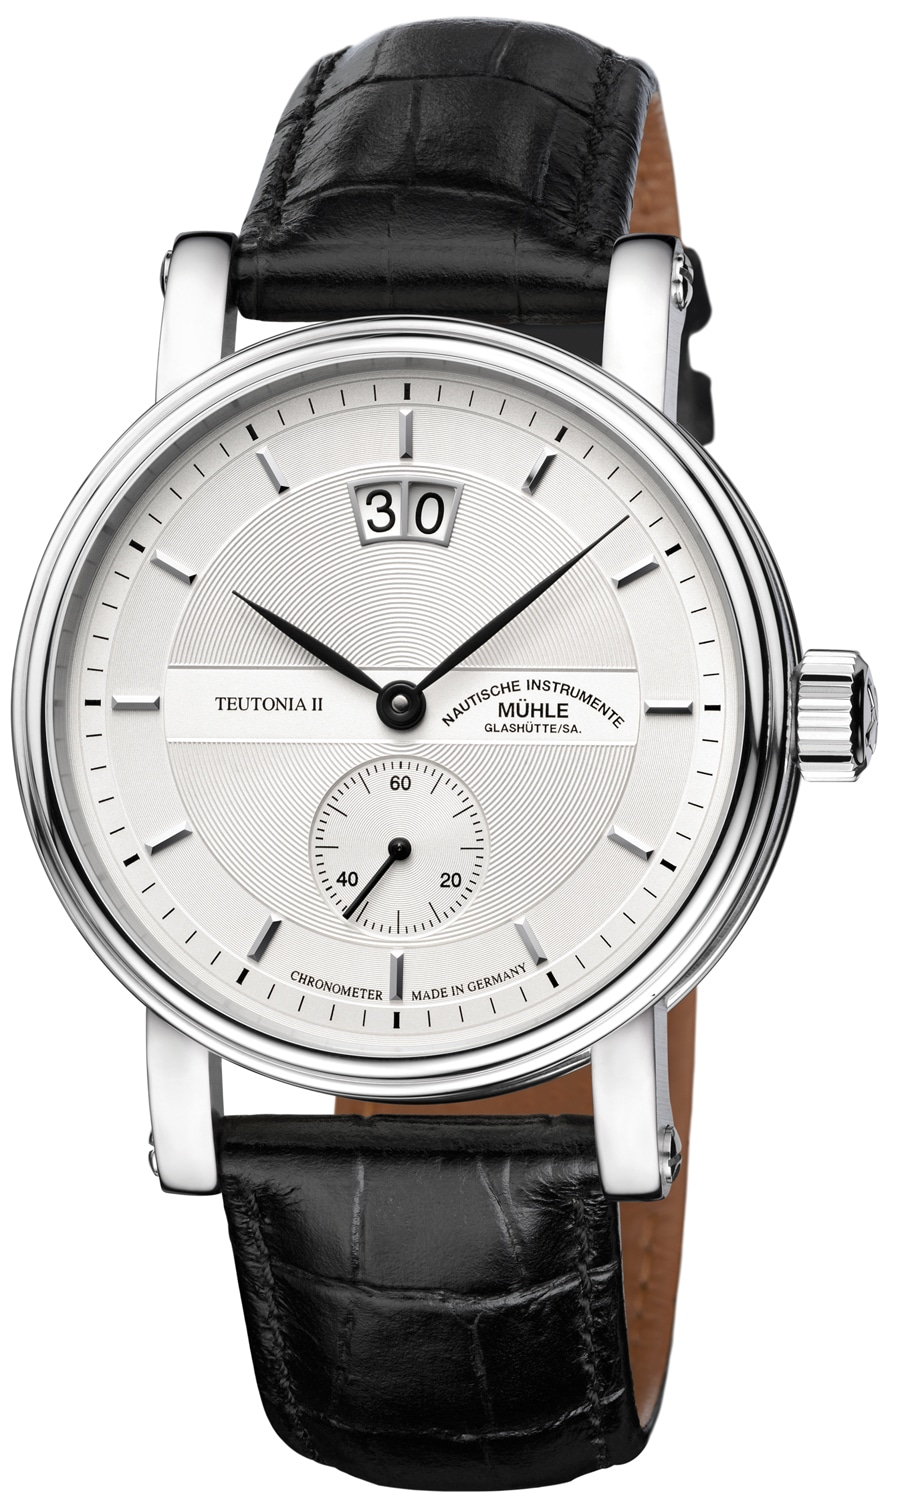 Mühle-Glashütte: Teutonia II Großdatum Chronometer